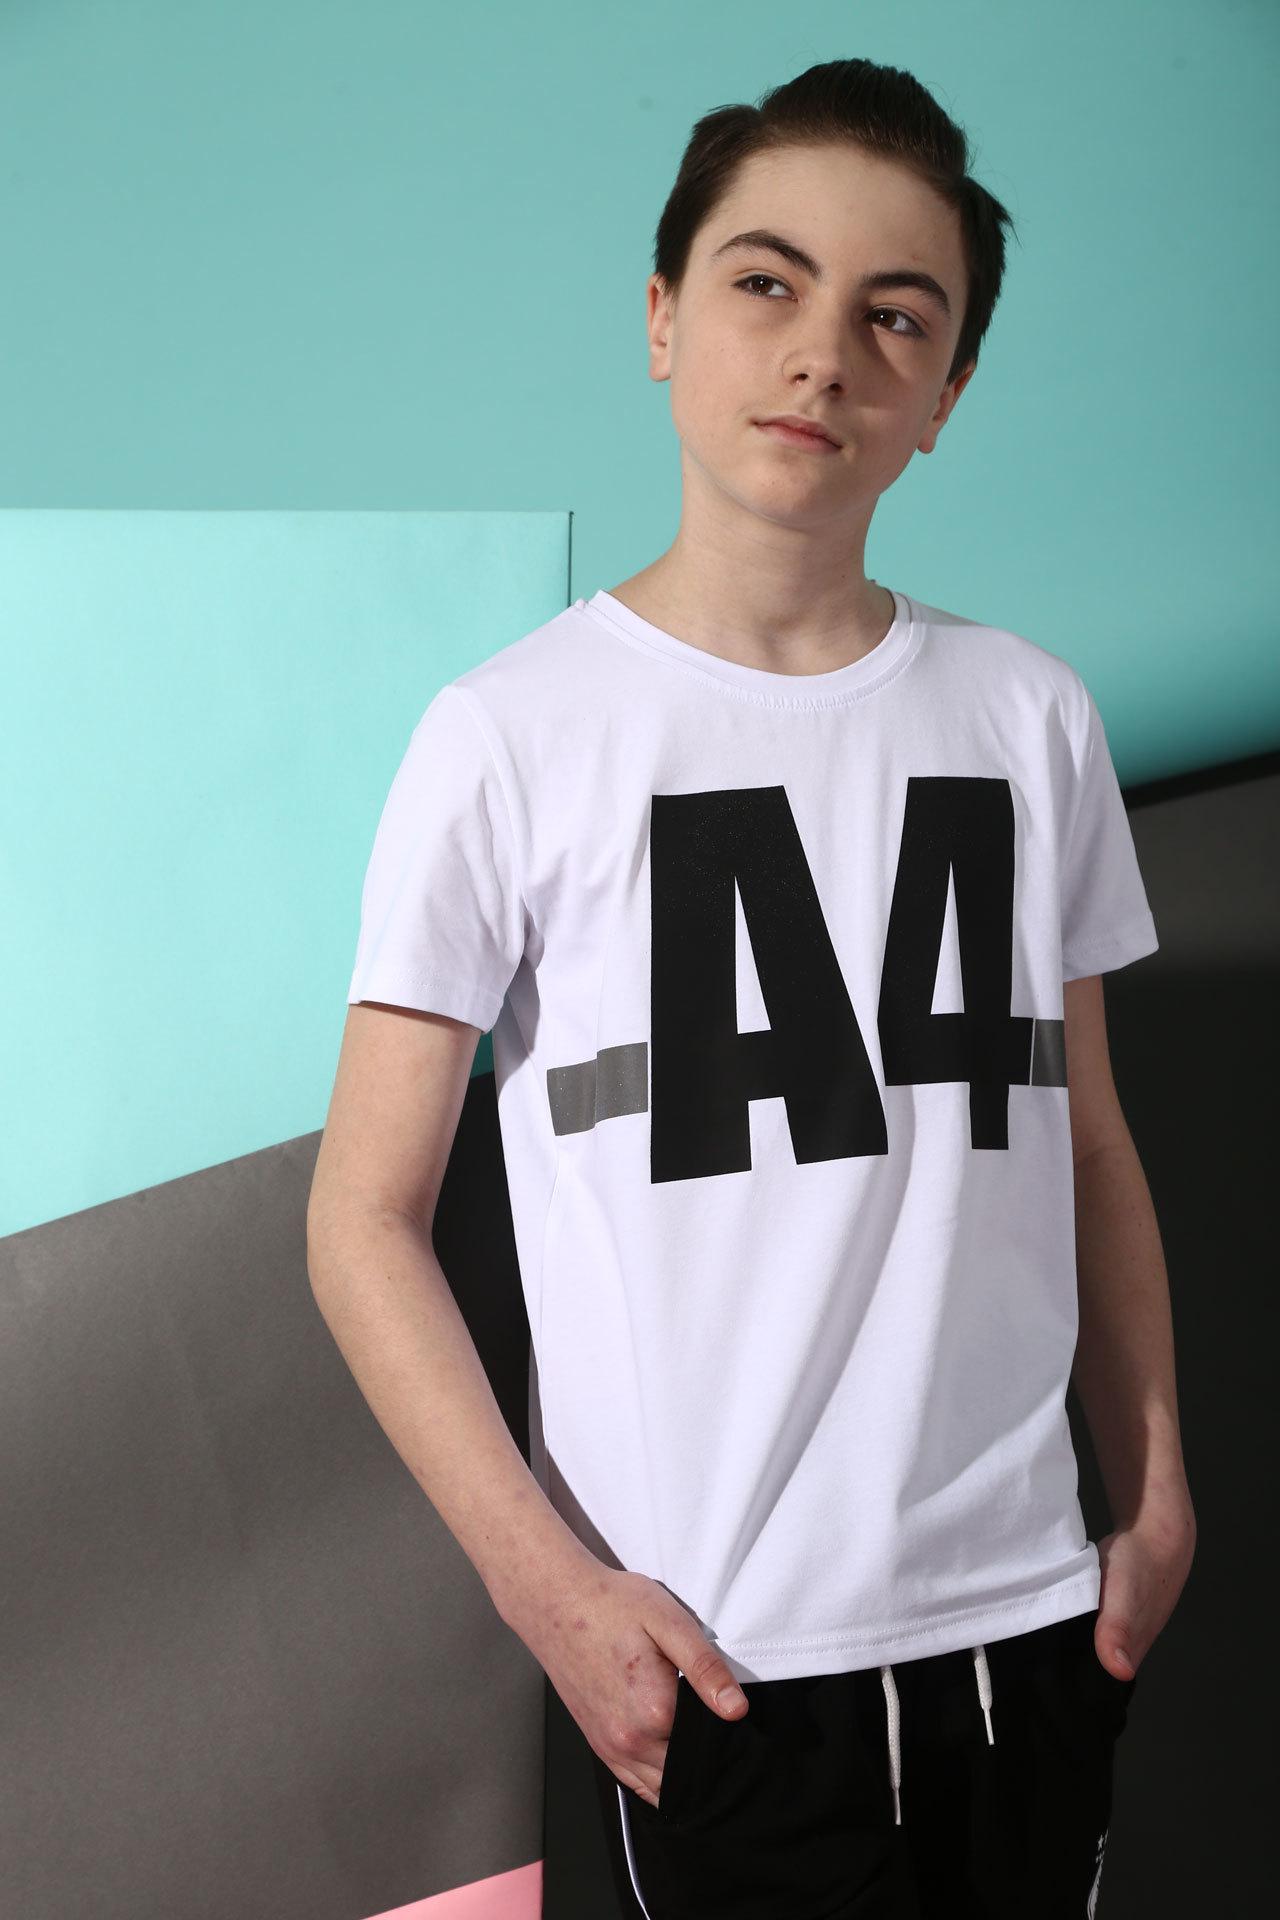 Футболка для мальчика A4 Bold Турция, 7529 (140-176)